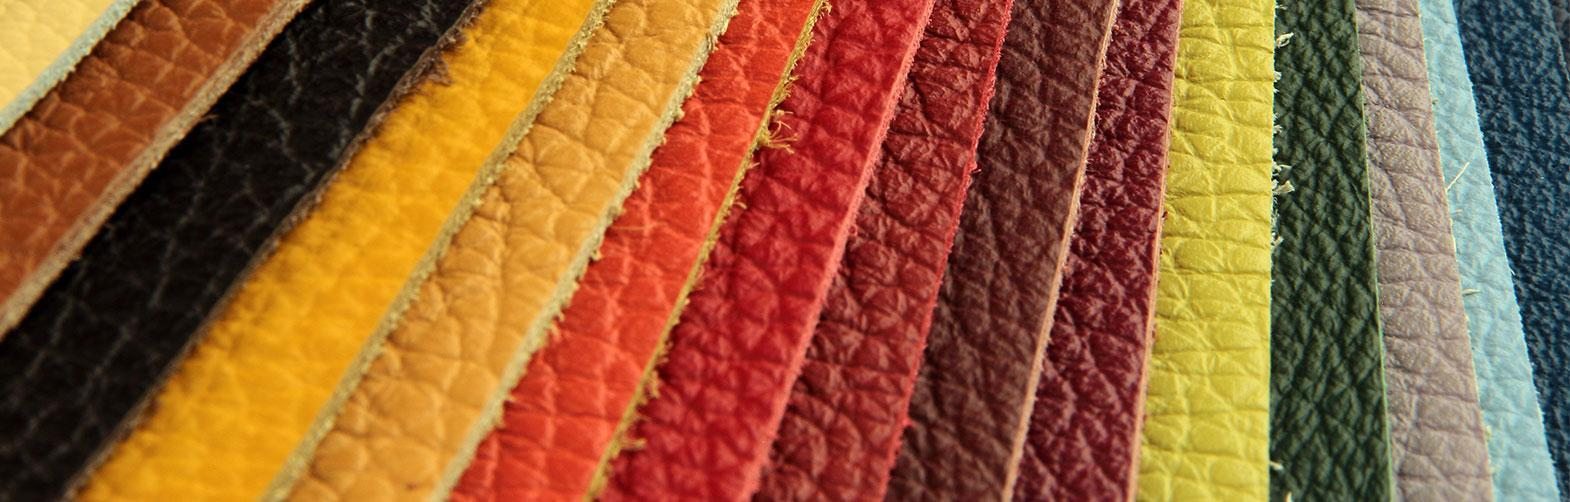 textiel-leder2_1.jpg